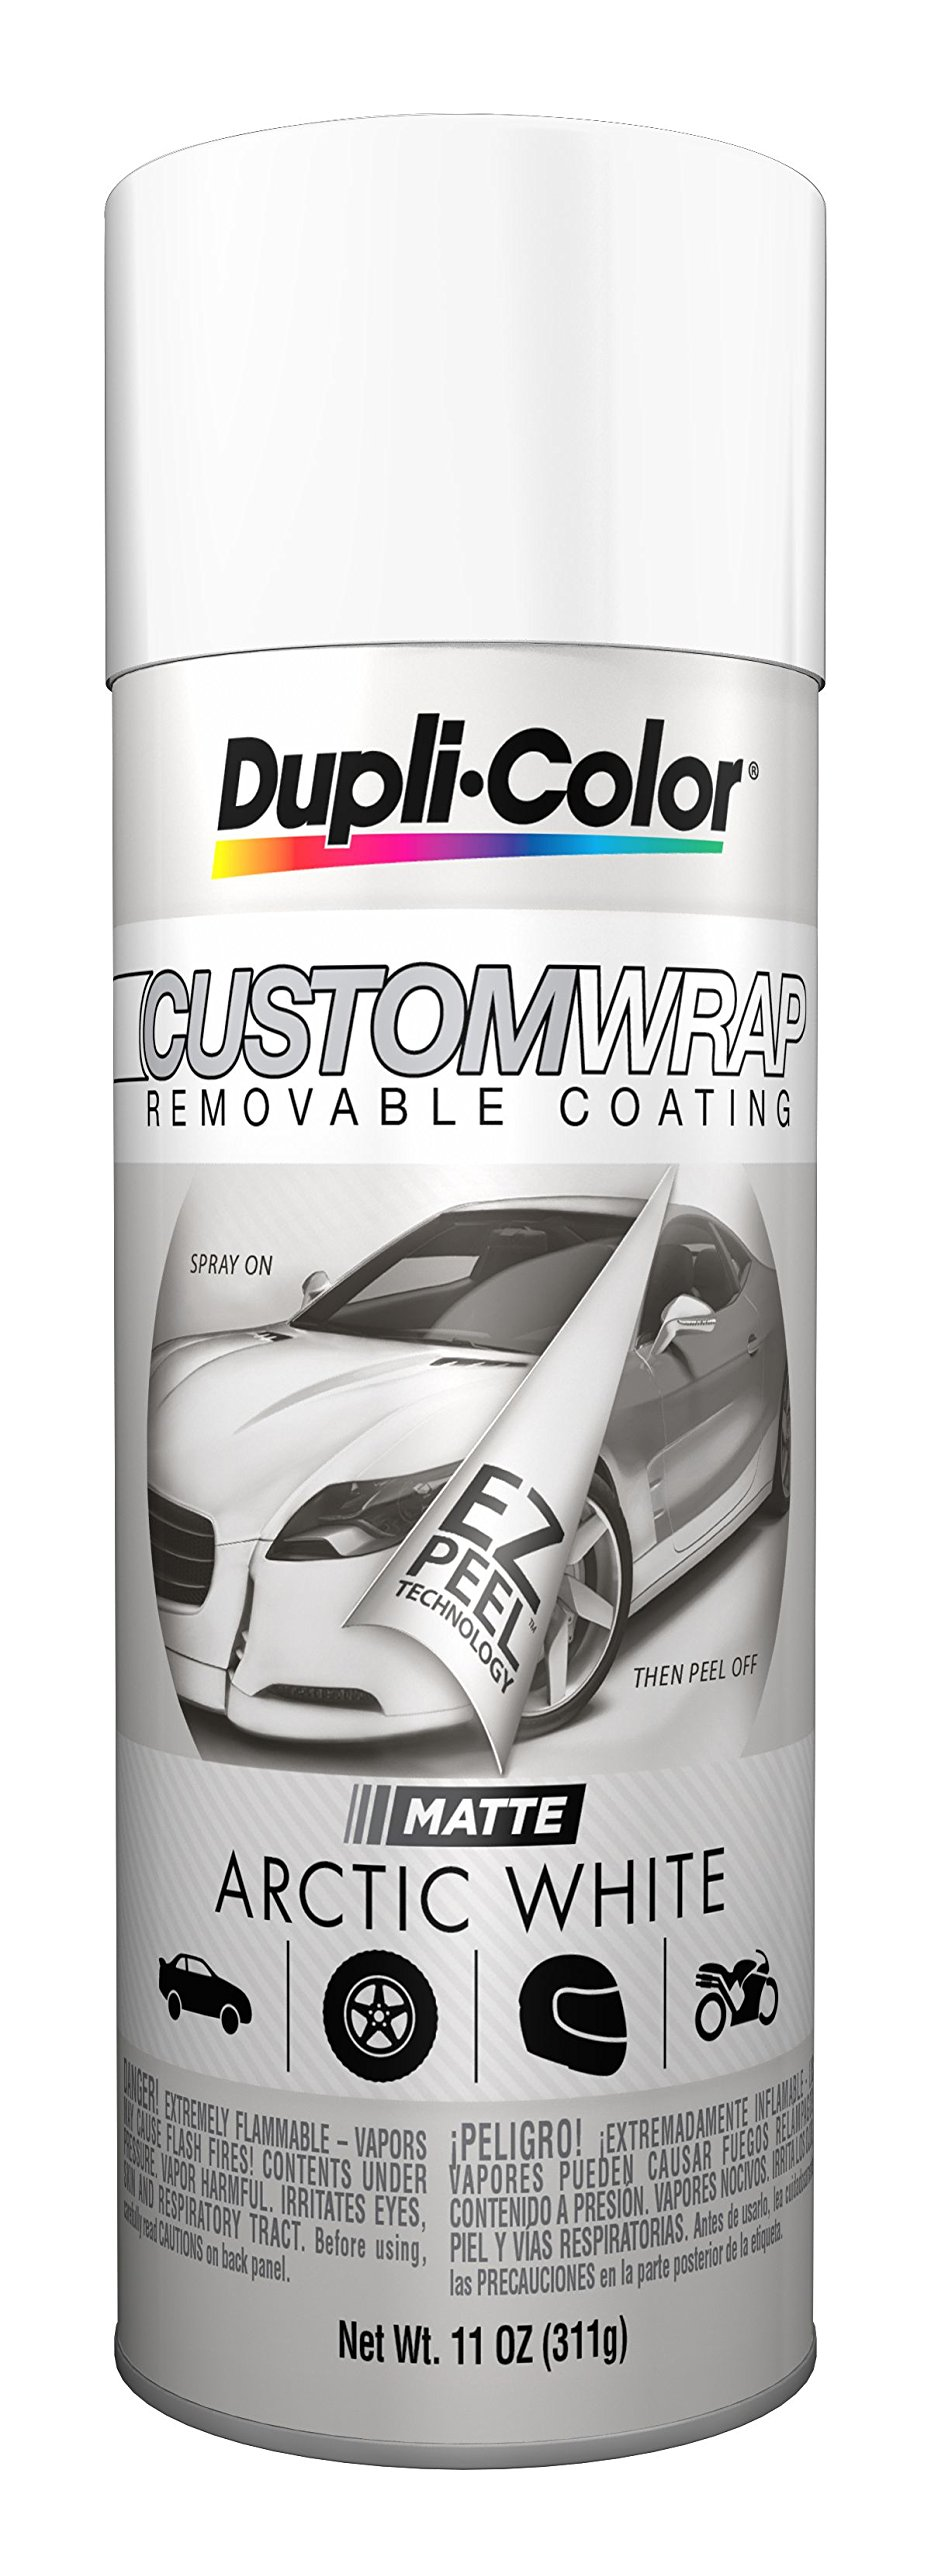 Dupli-Color CWRC798-6PK Custom Wrap Removable Coating - 11 fl. oz, (Pack of 6)